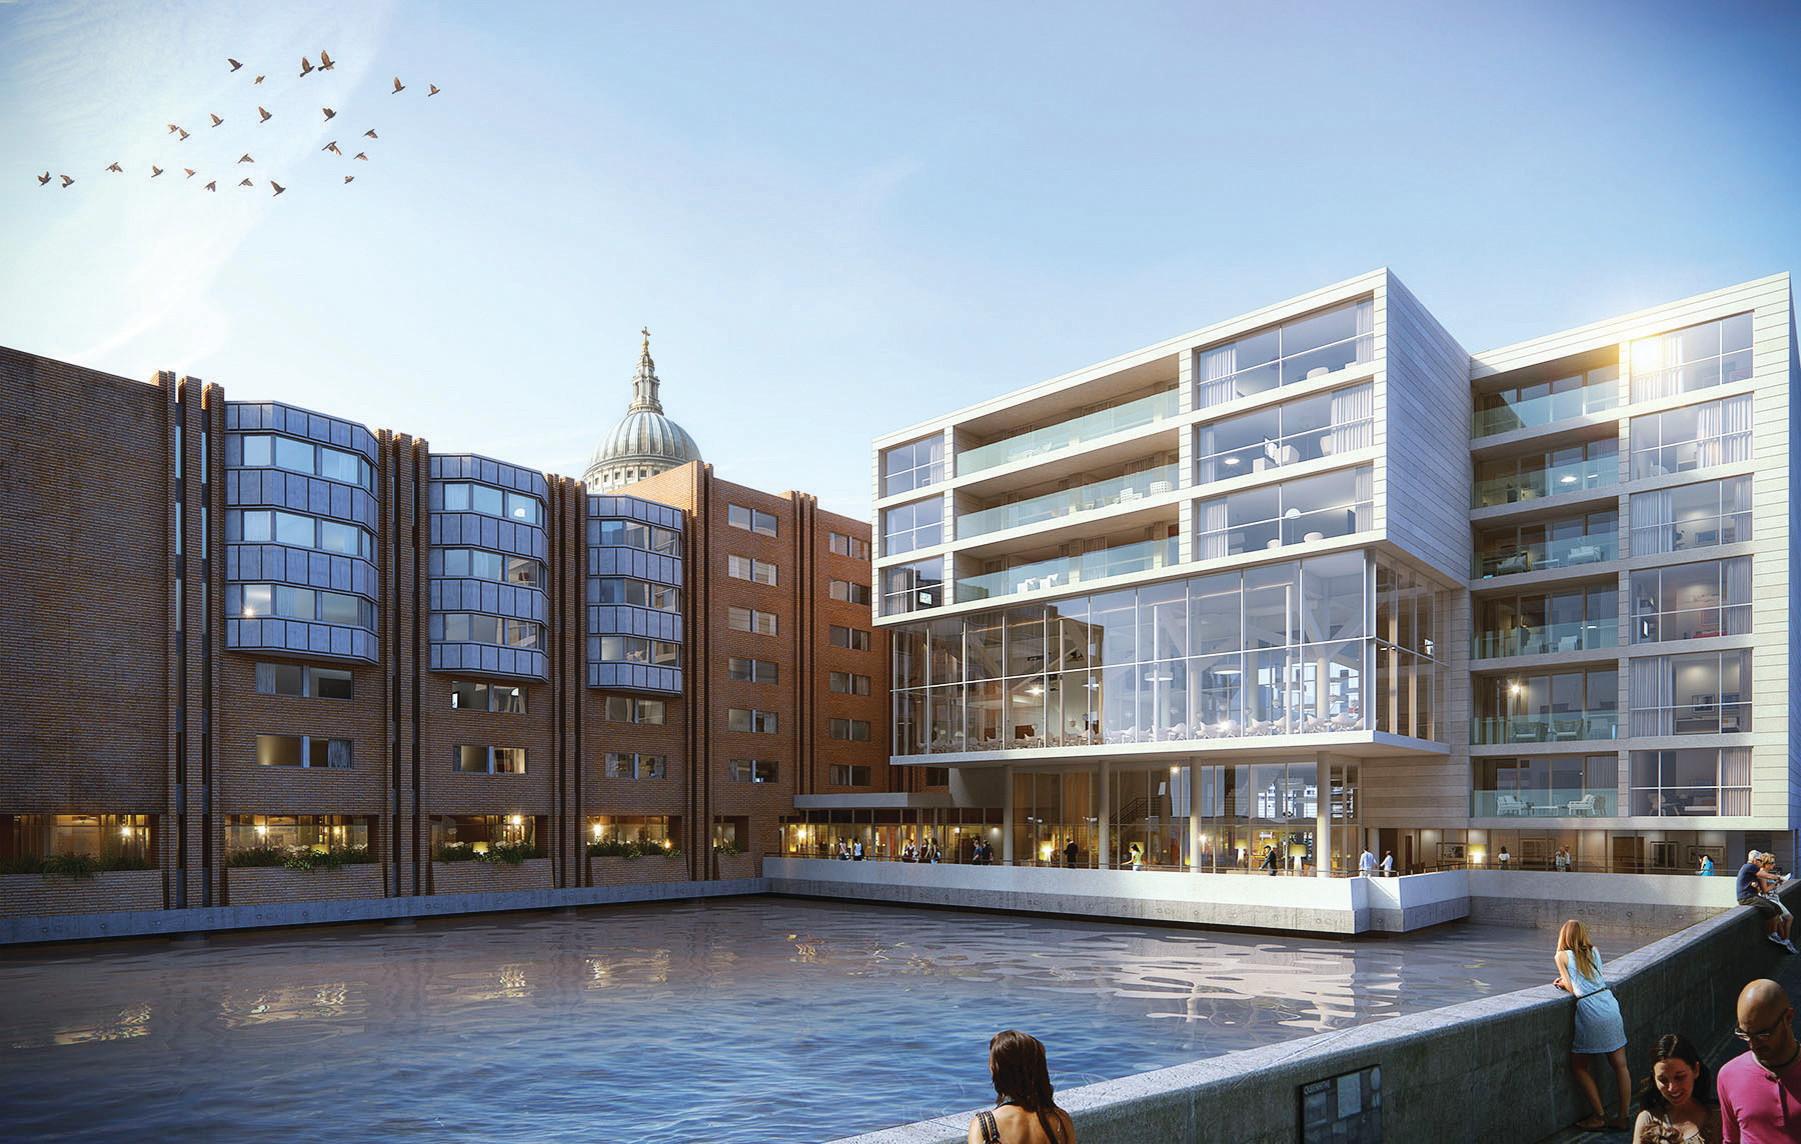 queensbridge house mansion house london future 54. Black Bedroom Furniture Sets. Home Design Ideas